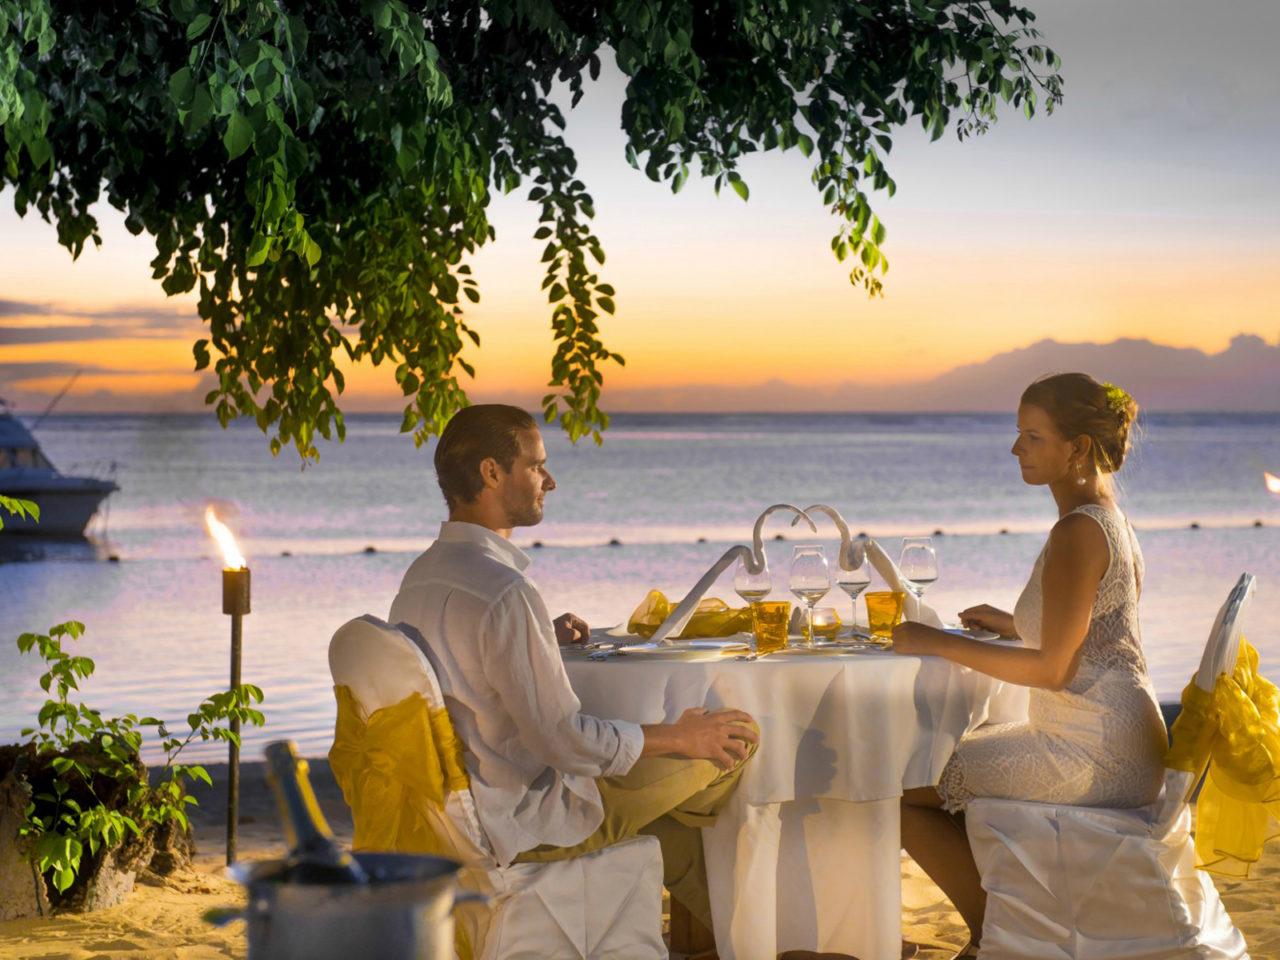 Girl And Boy Romantic Wallpaper Love Couple Romantic Dinner On The Beach Hd Love Wallpaper